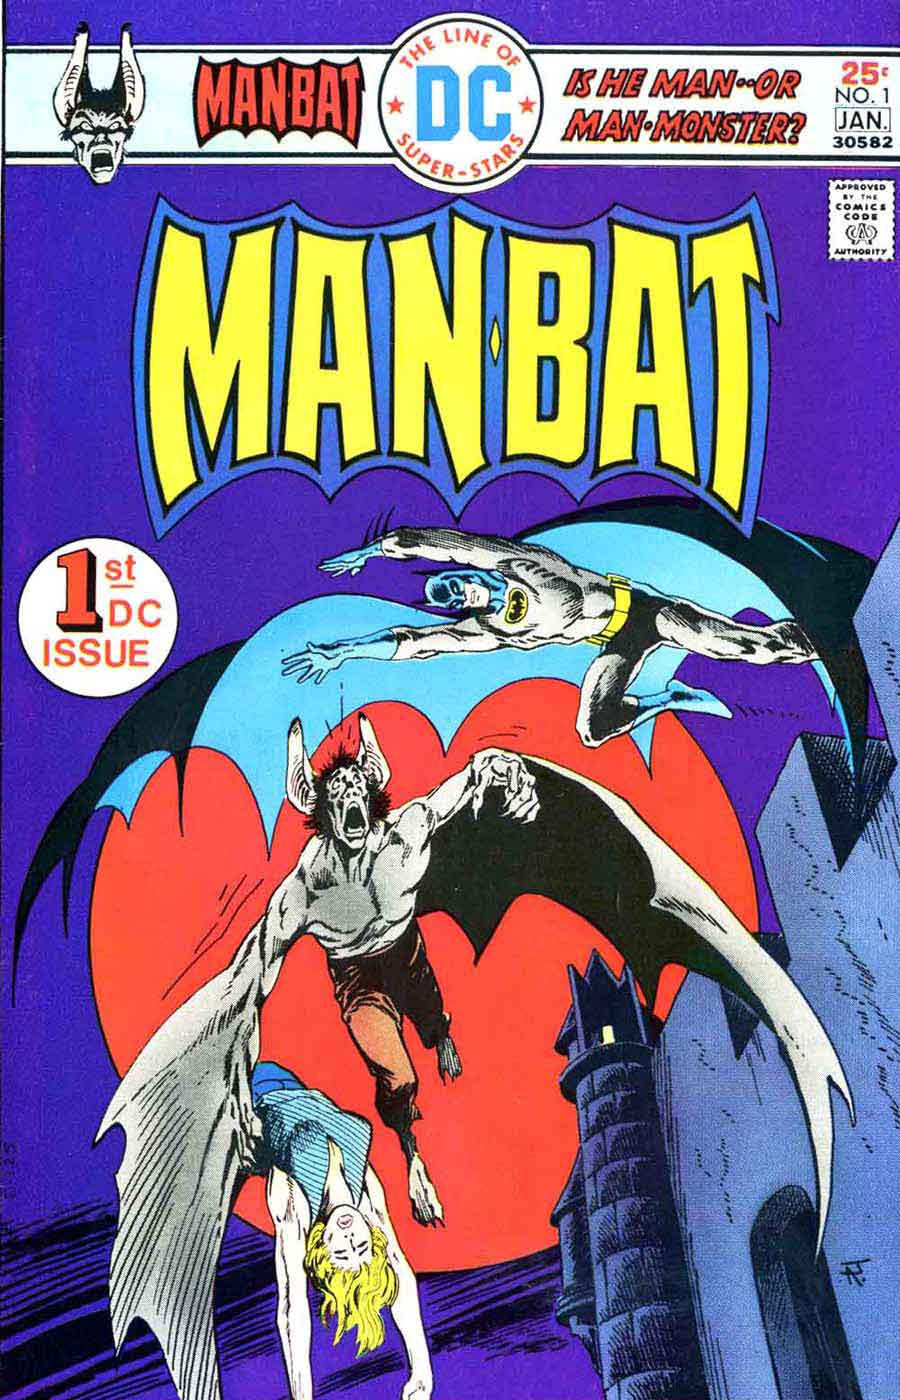 Man-Bat v1 #1 dc comic book cover art by Jim Aparo